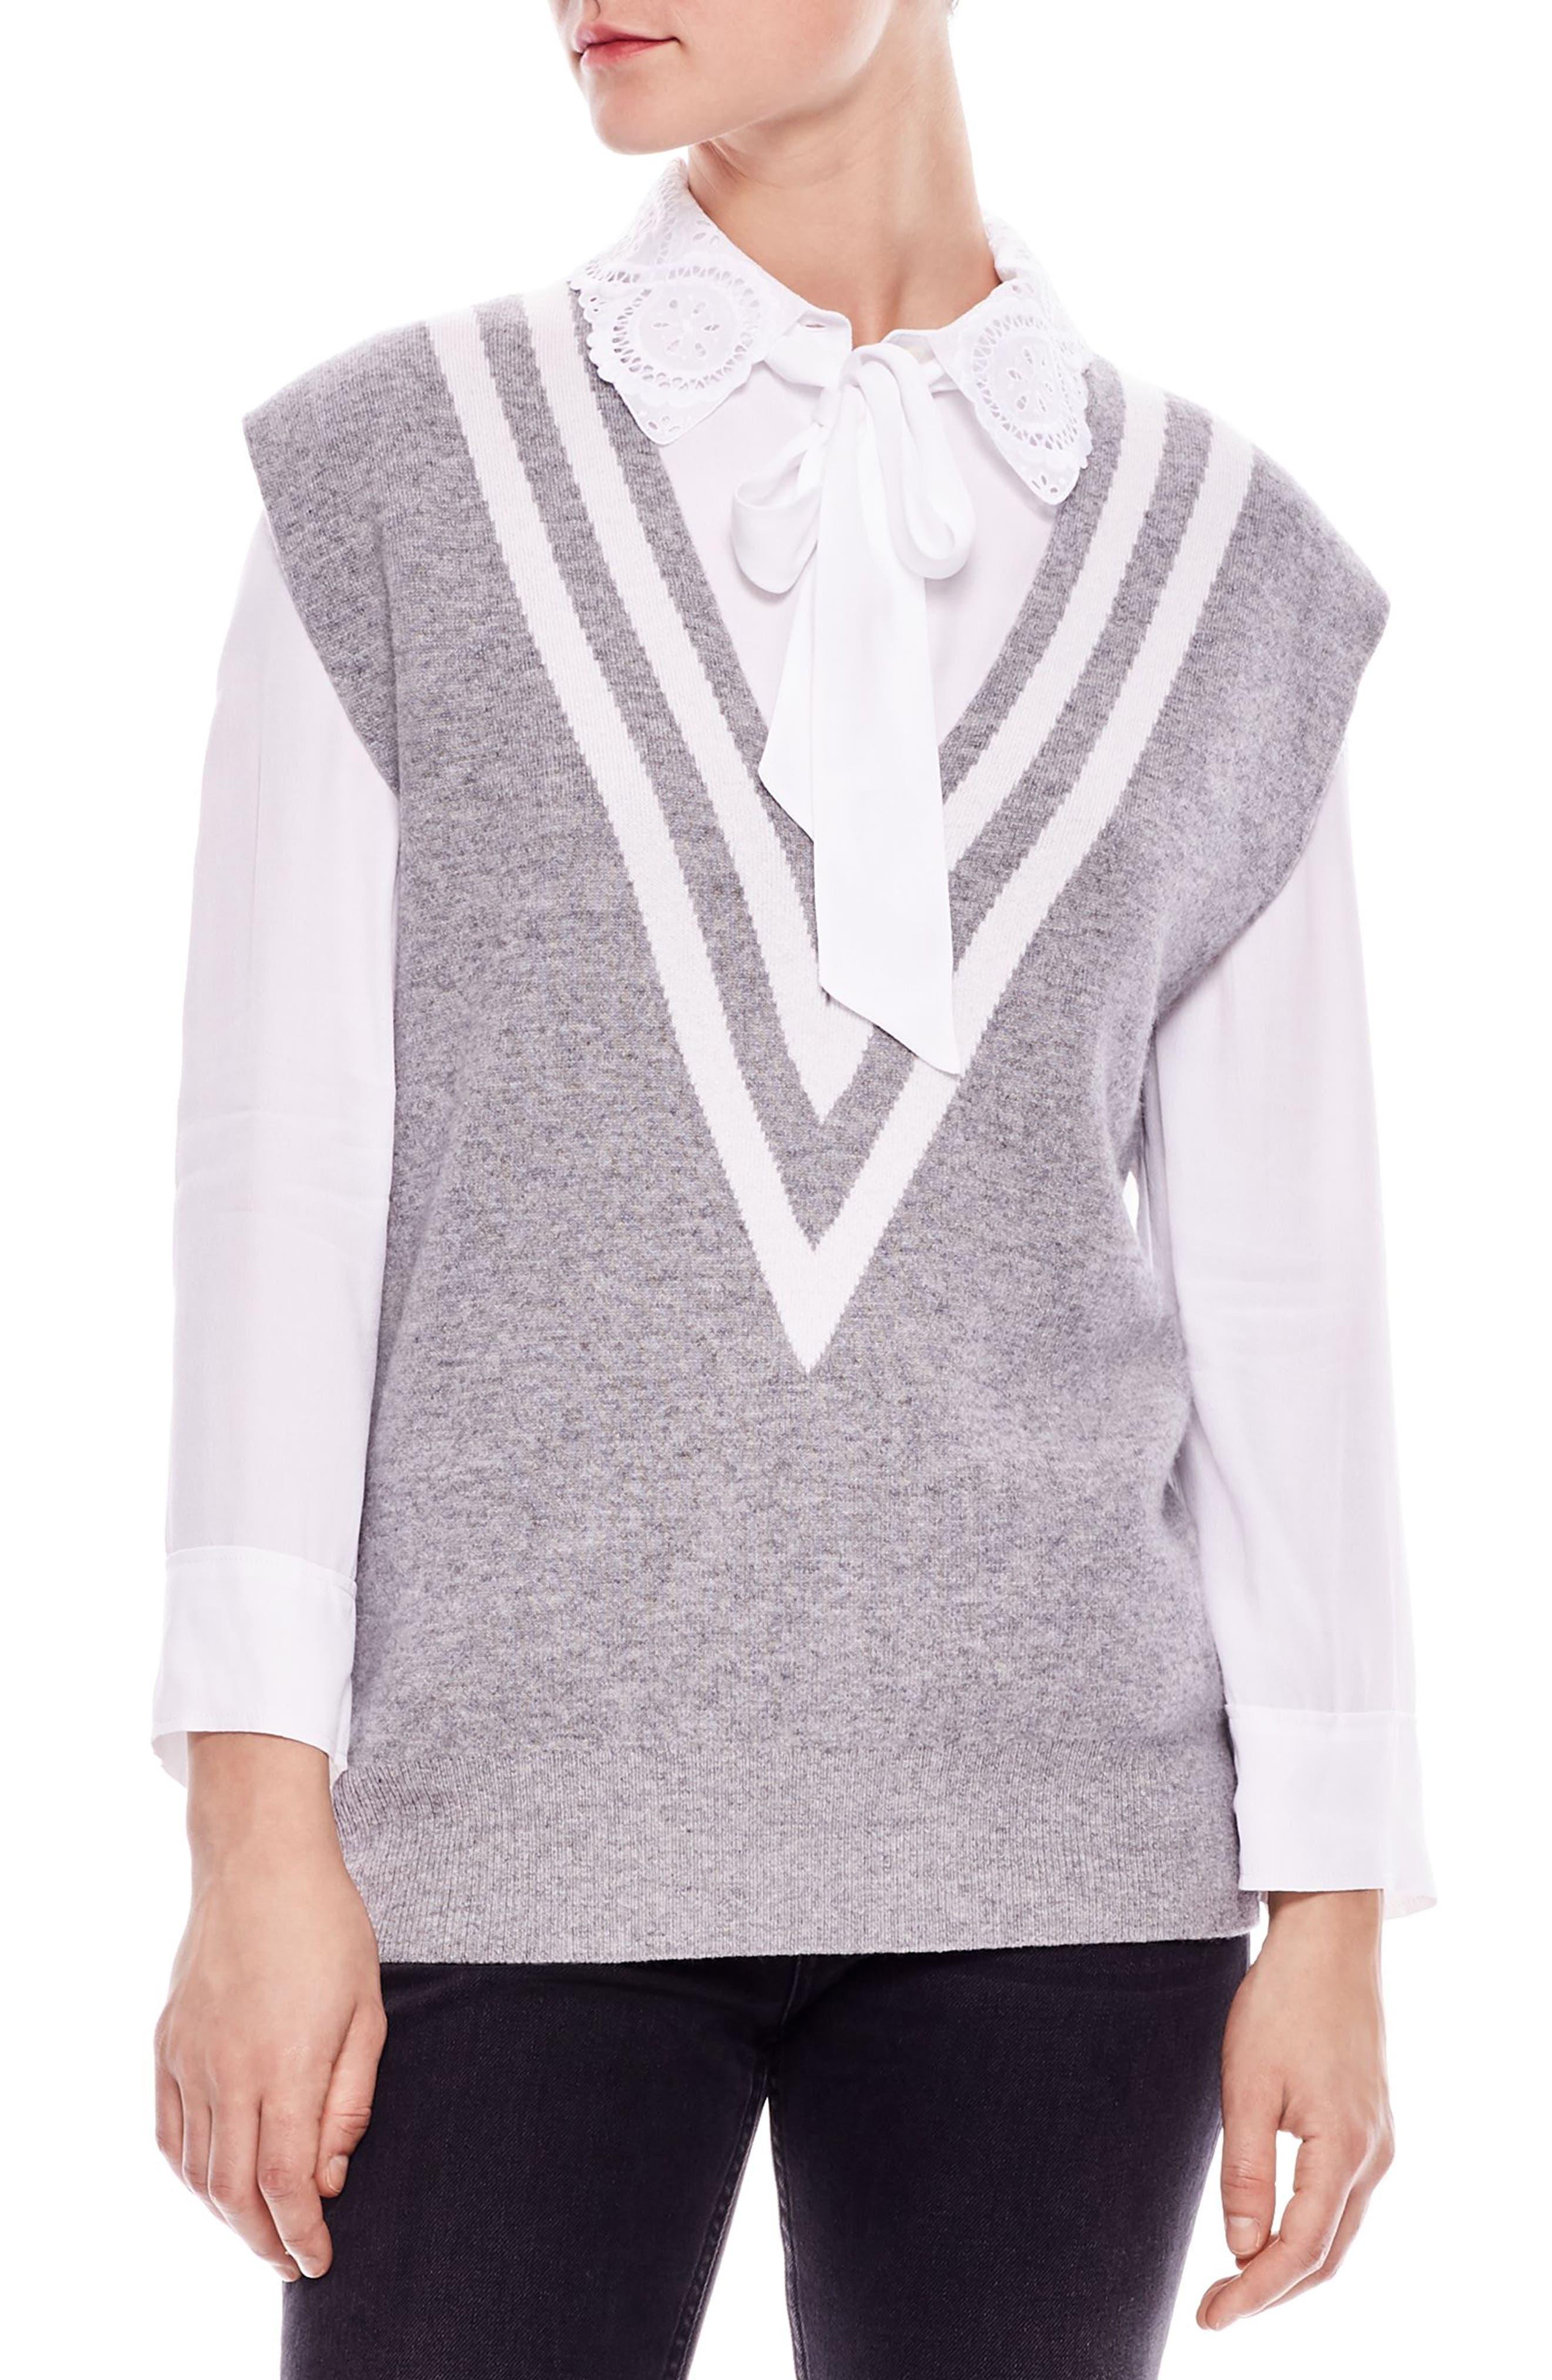 Tabby Sweater,                             Main thumbnail 1, color,                             020